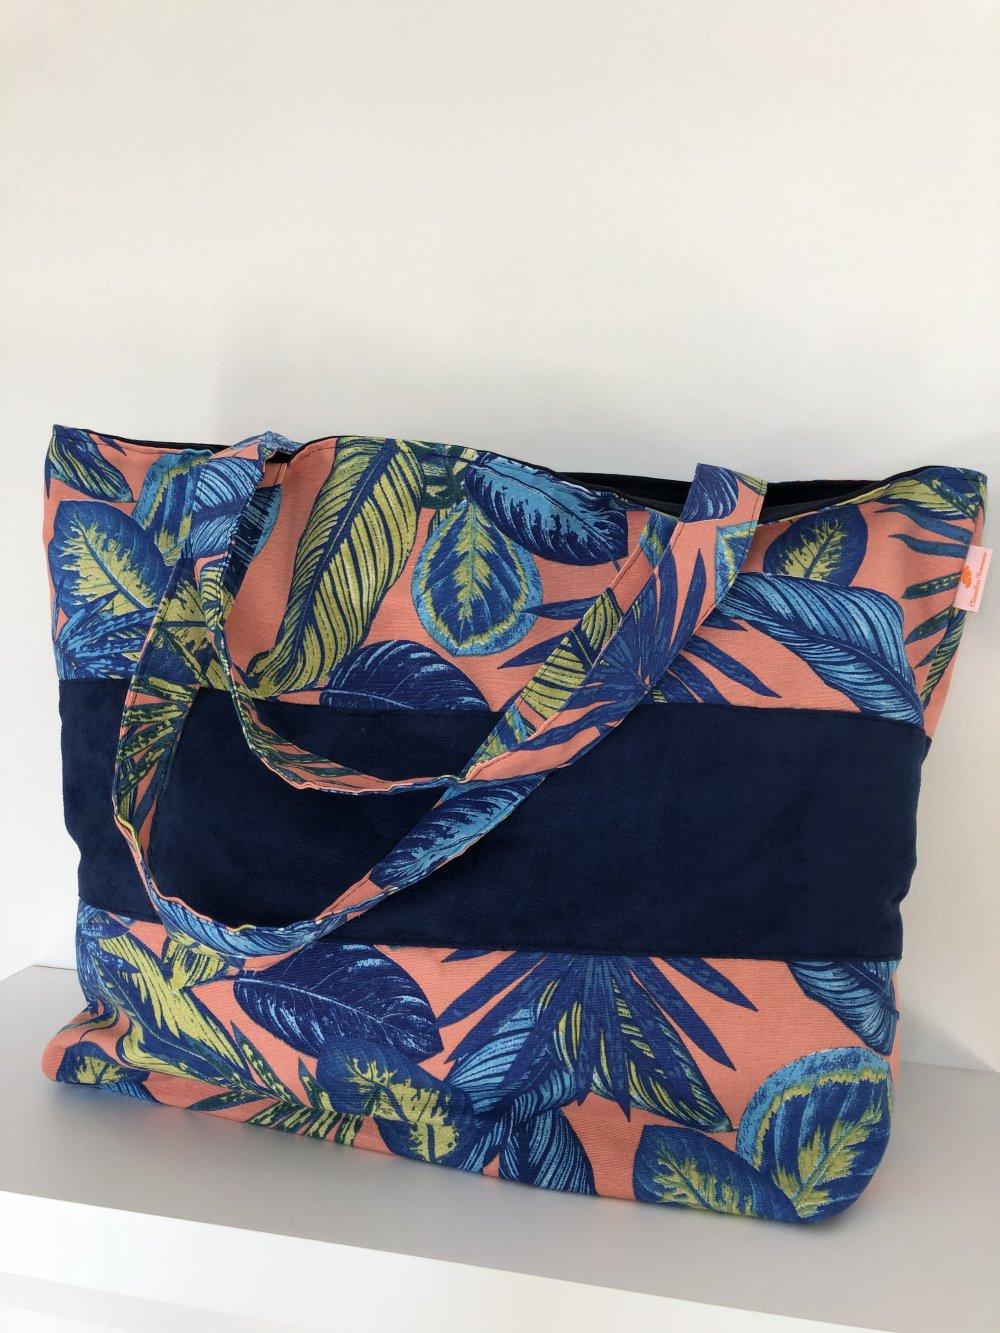 sac de plage, cabas, sac de courses tissu imprimé tissu feuillage exotique